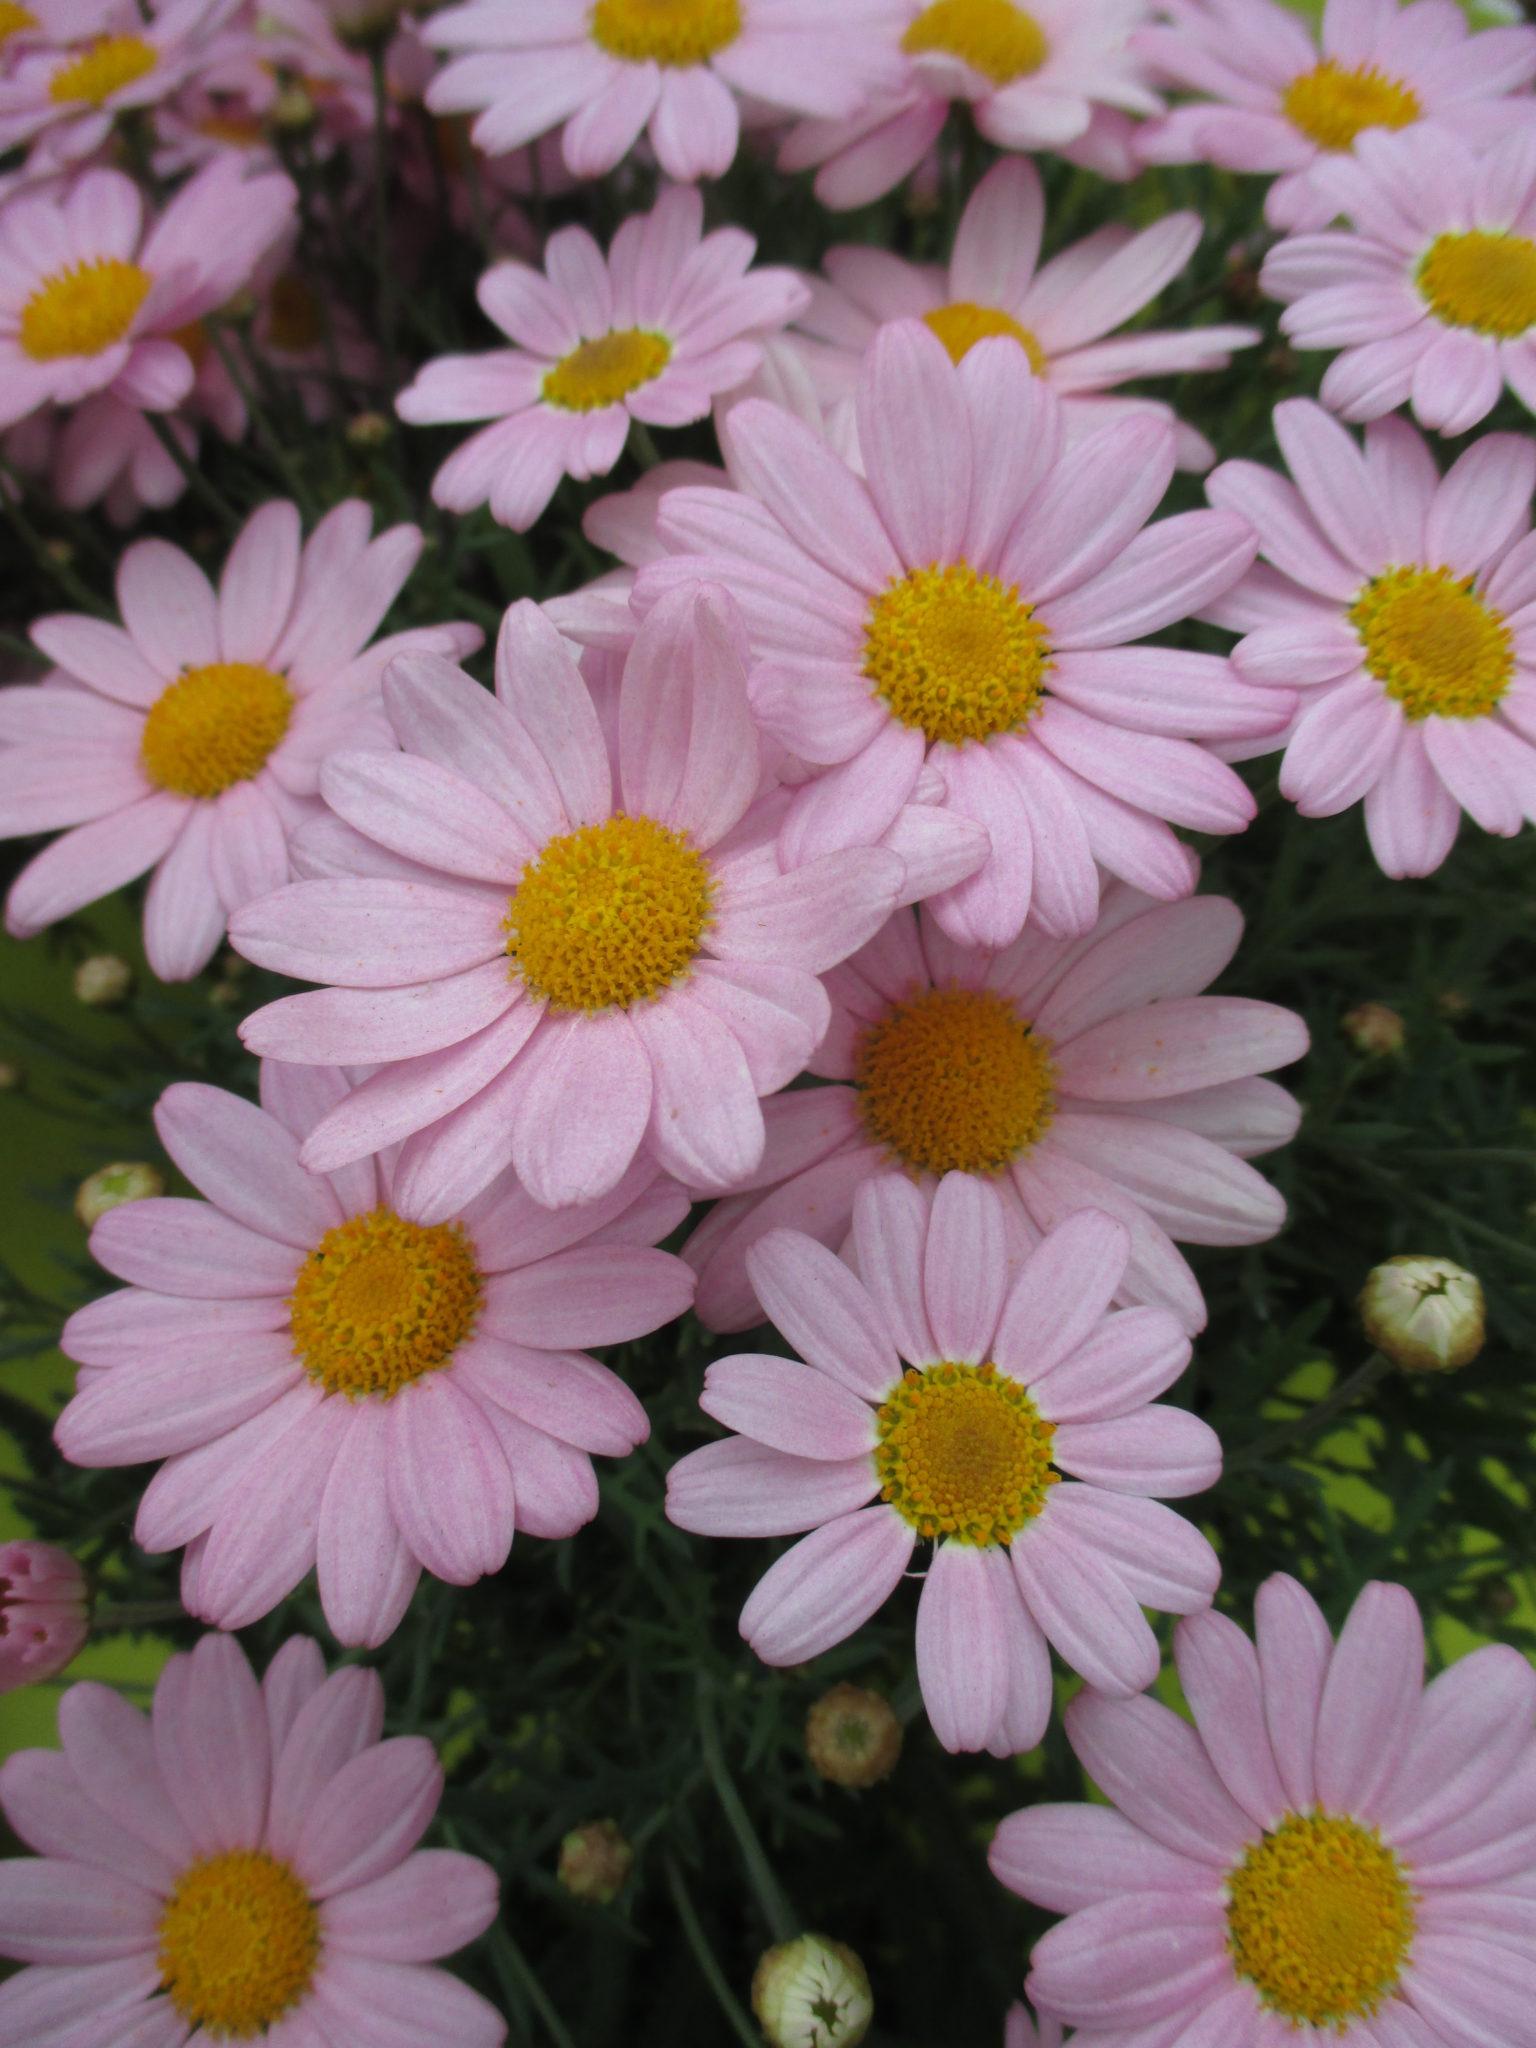 marguerite daisies for impact